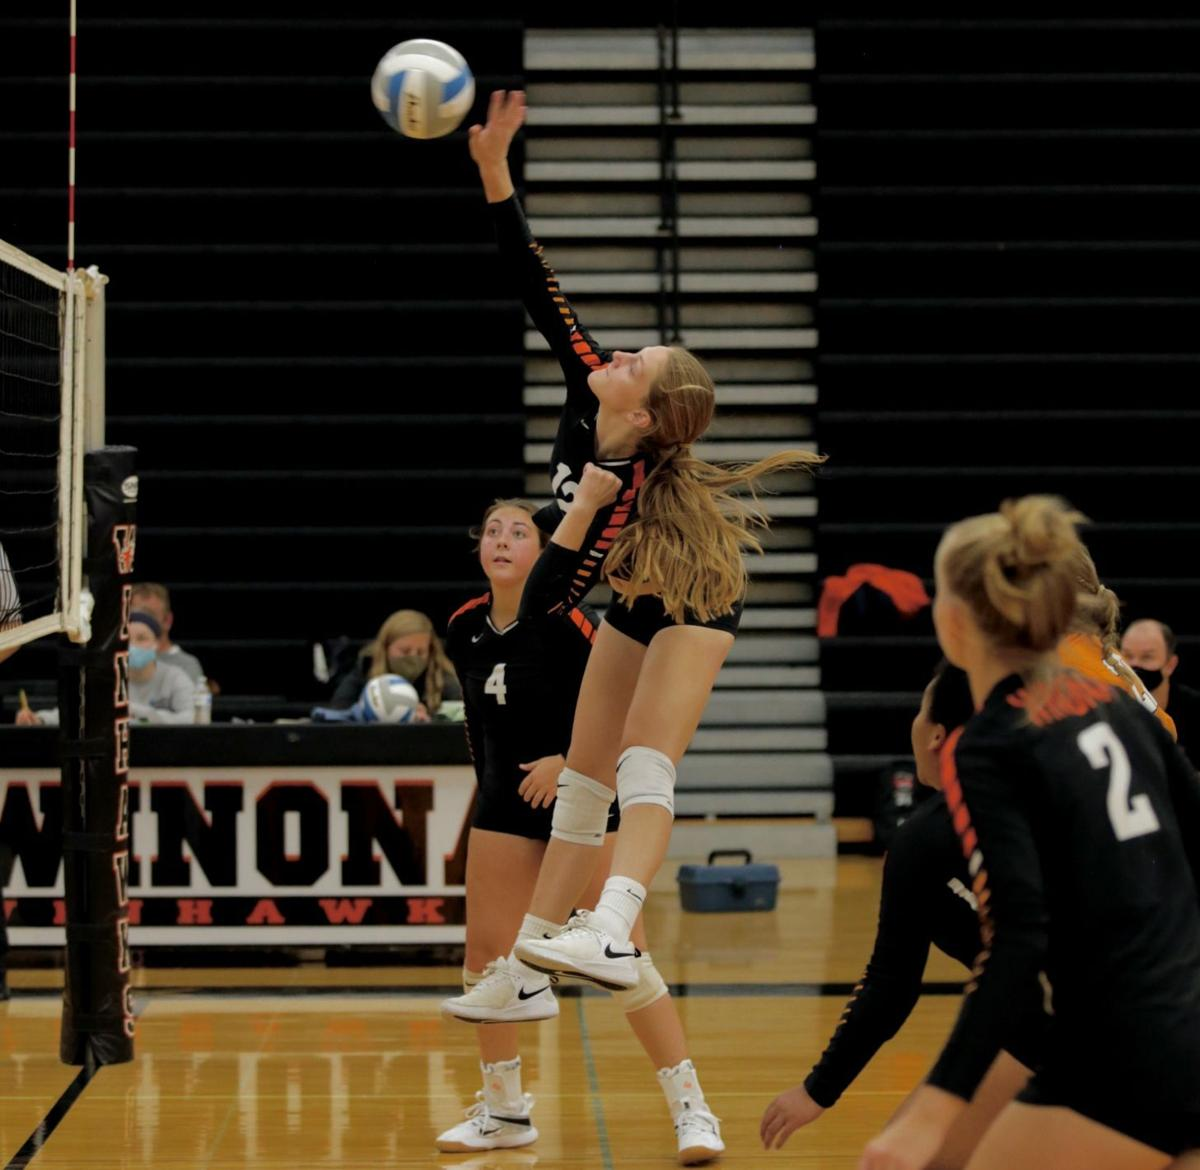 Photos: WSHS Volleyball vs Rochester JM